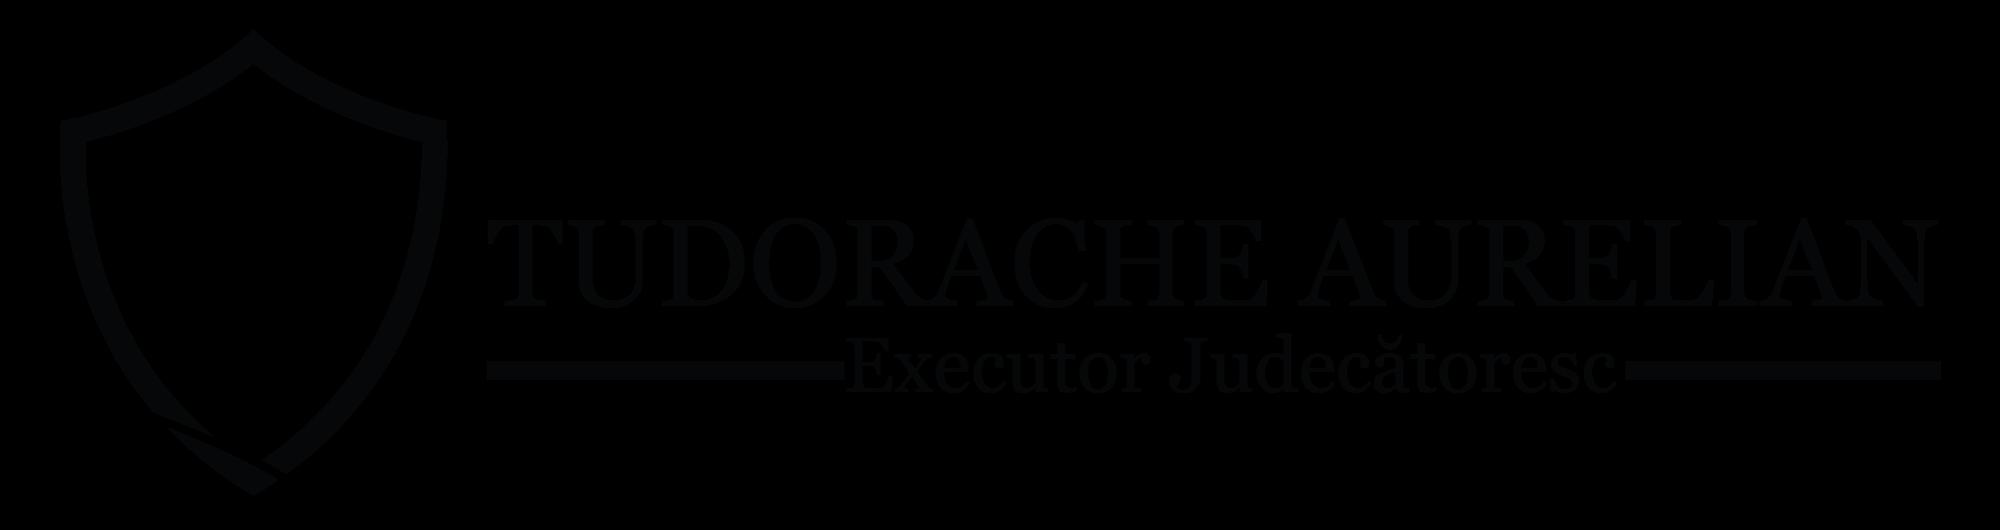 Executor Judecătoresc - Aurelian Tudorache